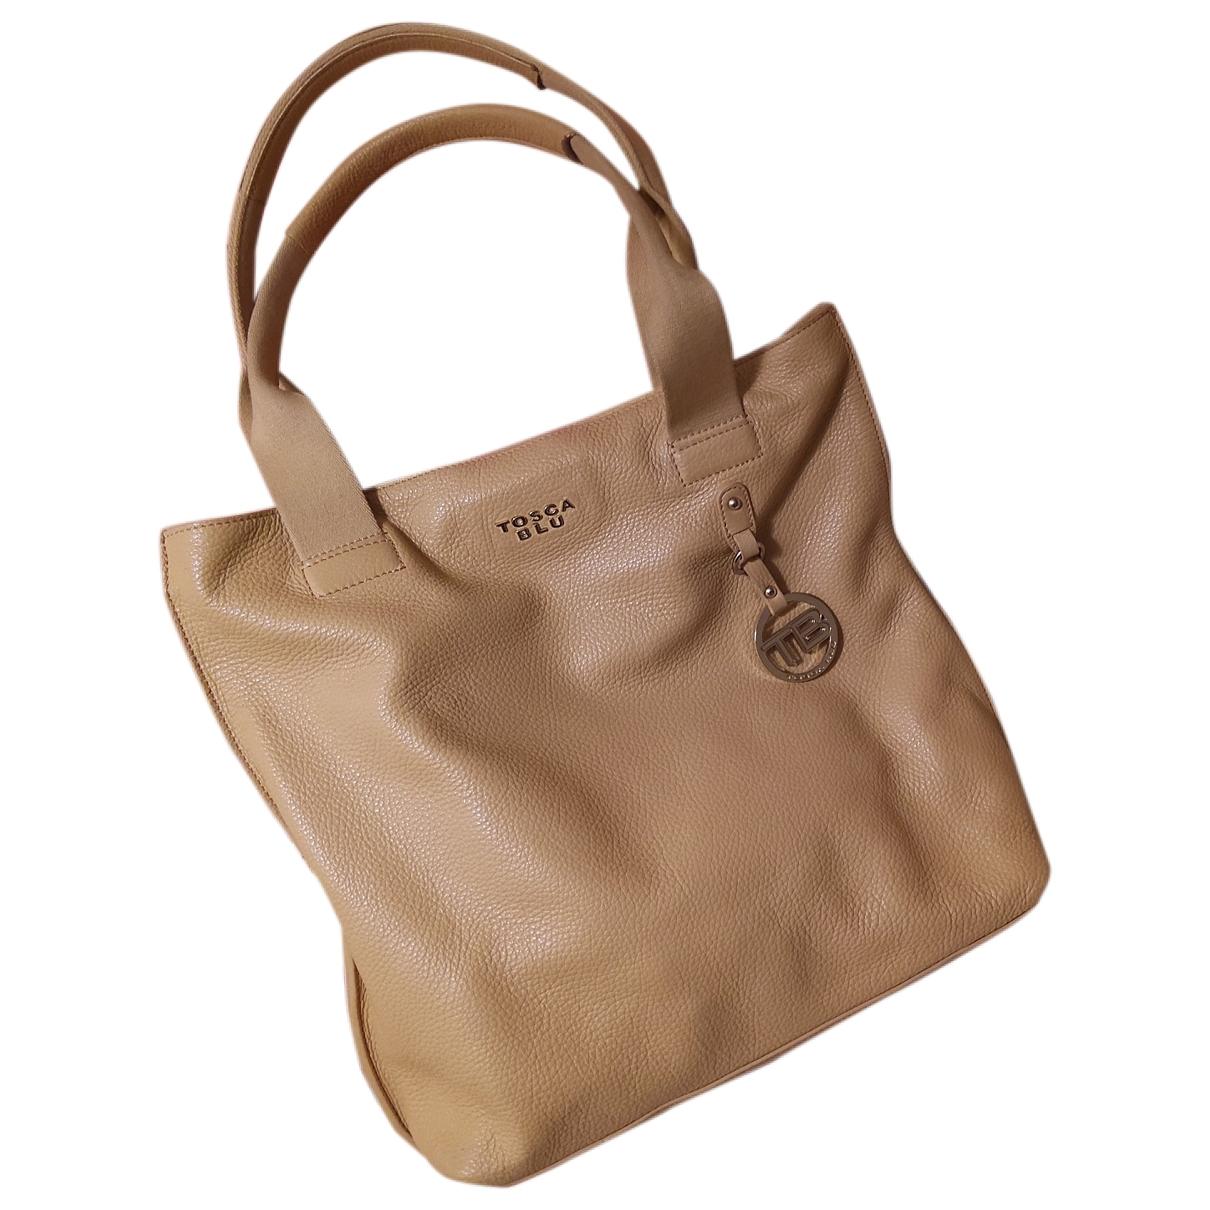 Tosca Blu \N Handtasche in  Beige Leder